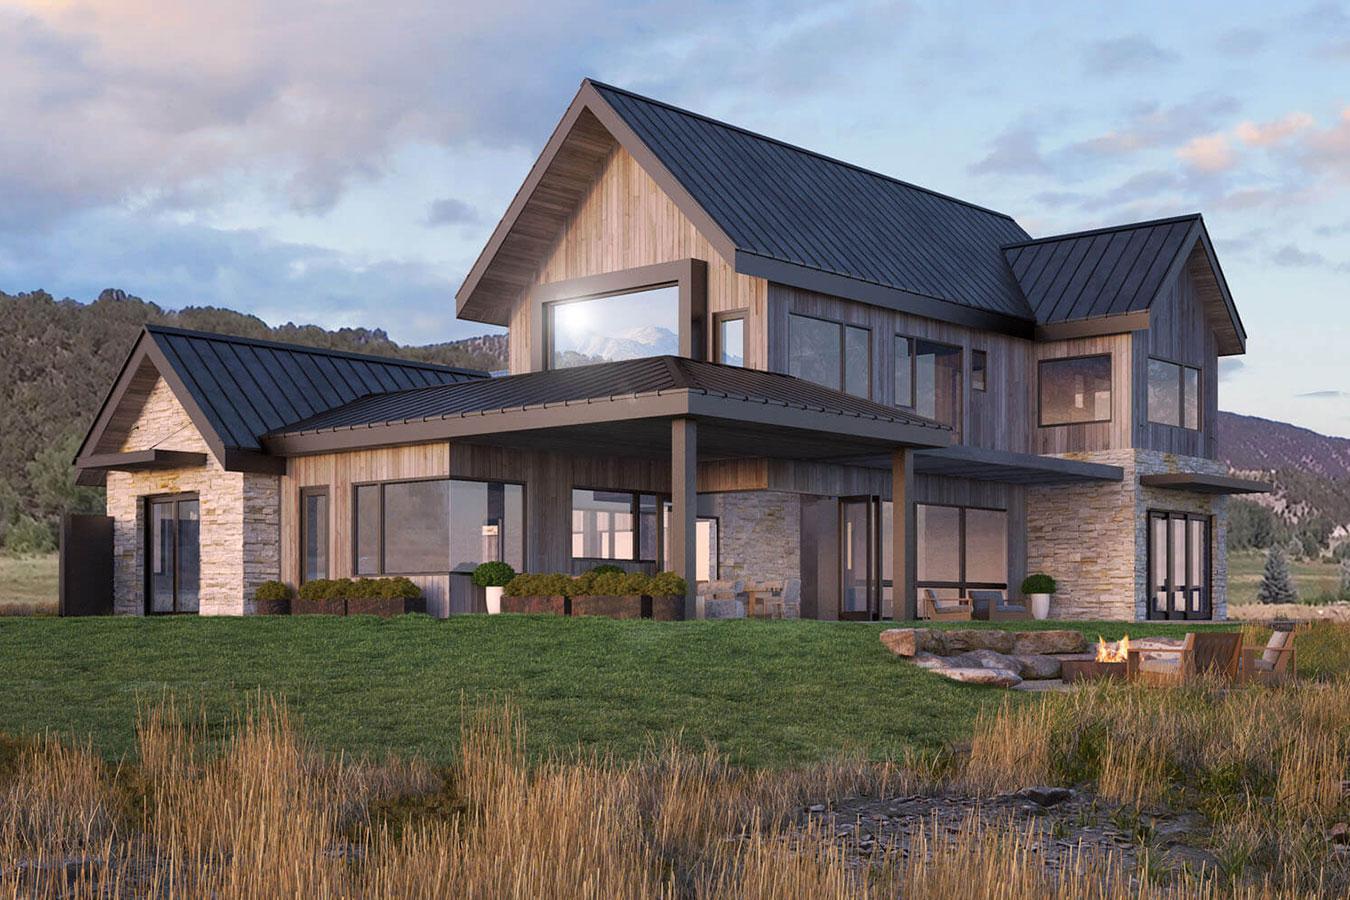 Coryell Brewster McLeod Architects